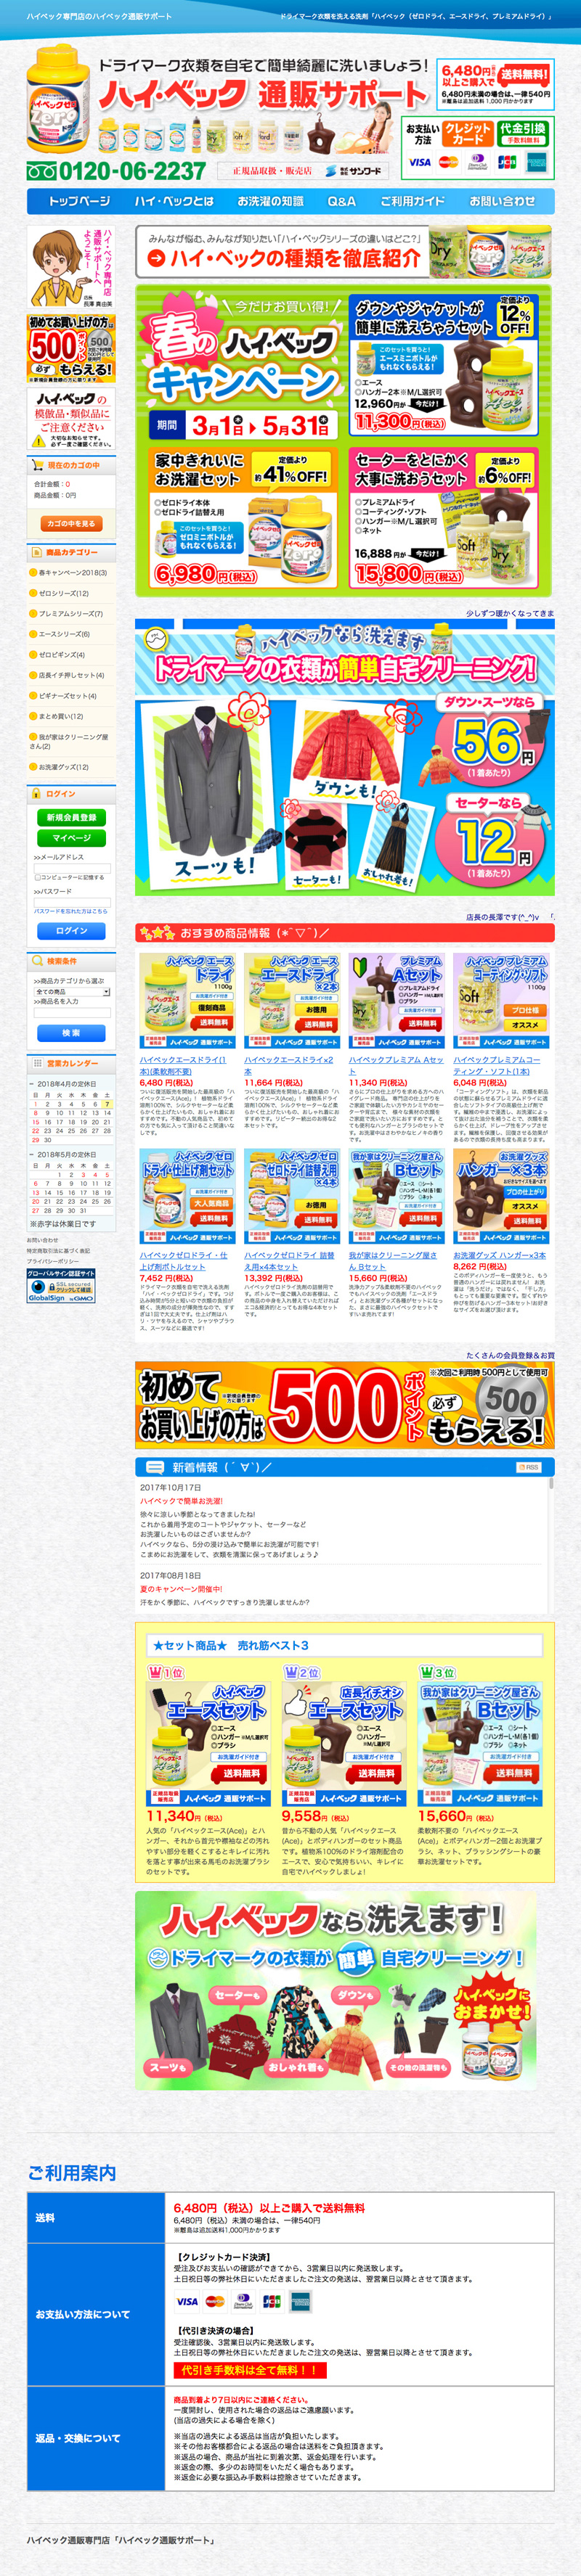 web_hibec.jpg